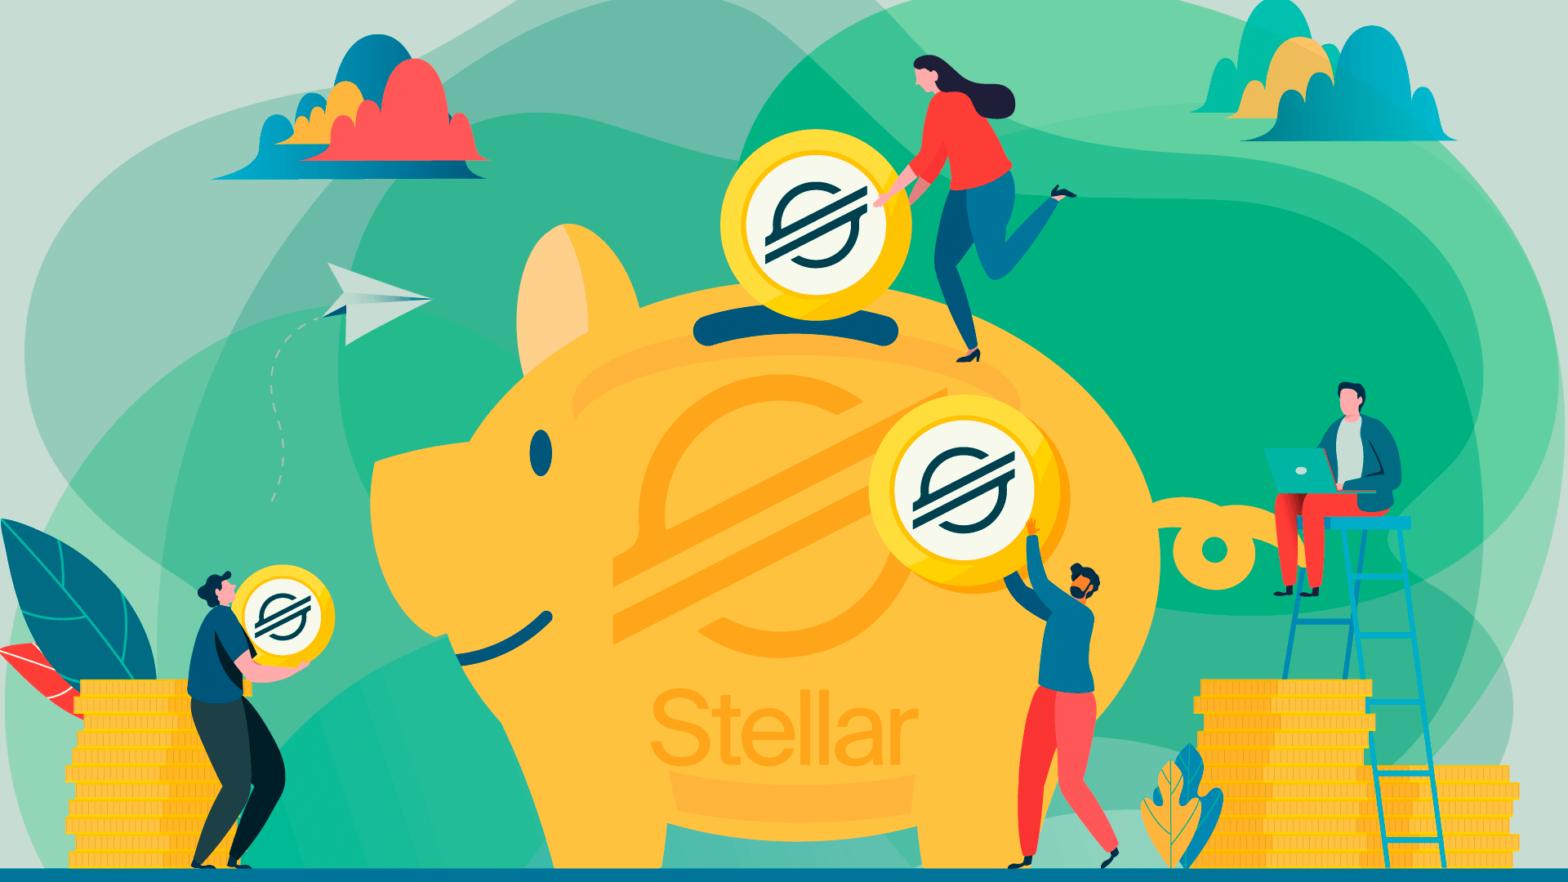 Stellar (XLM) News